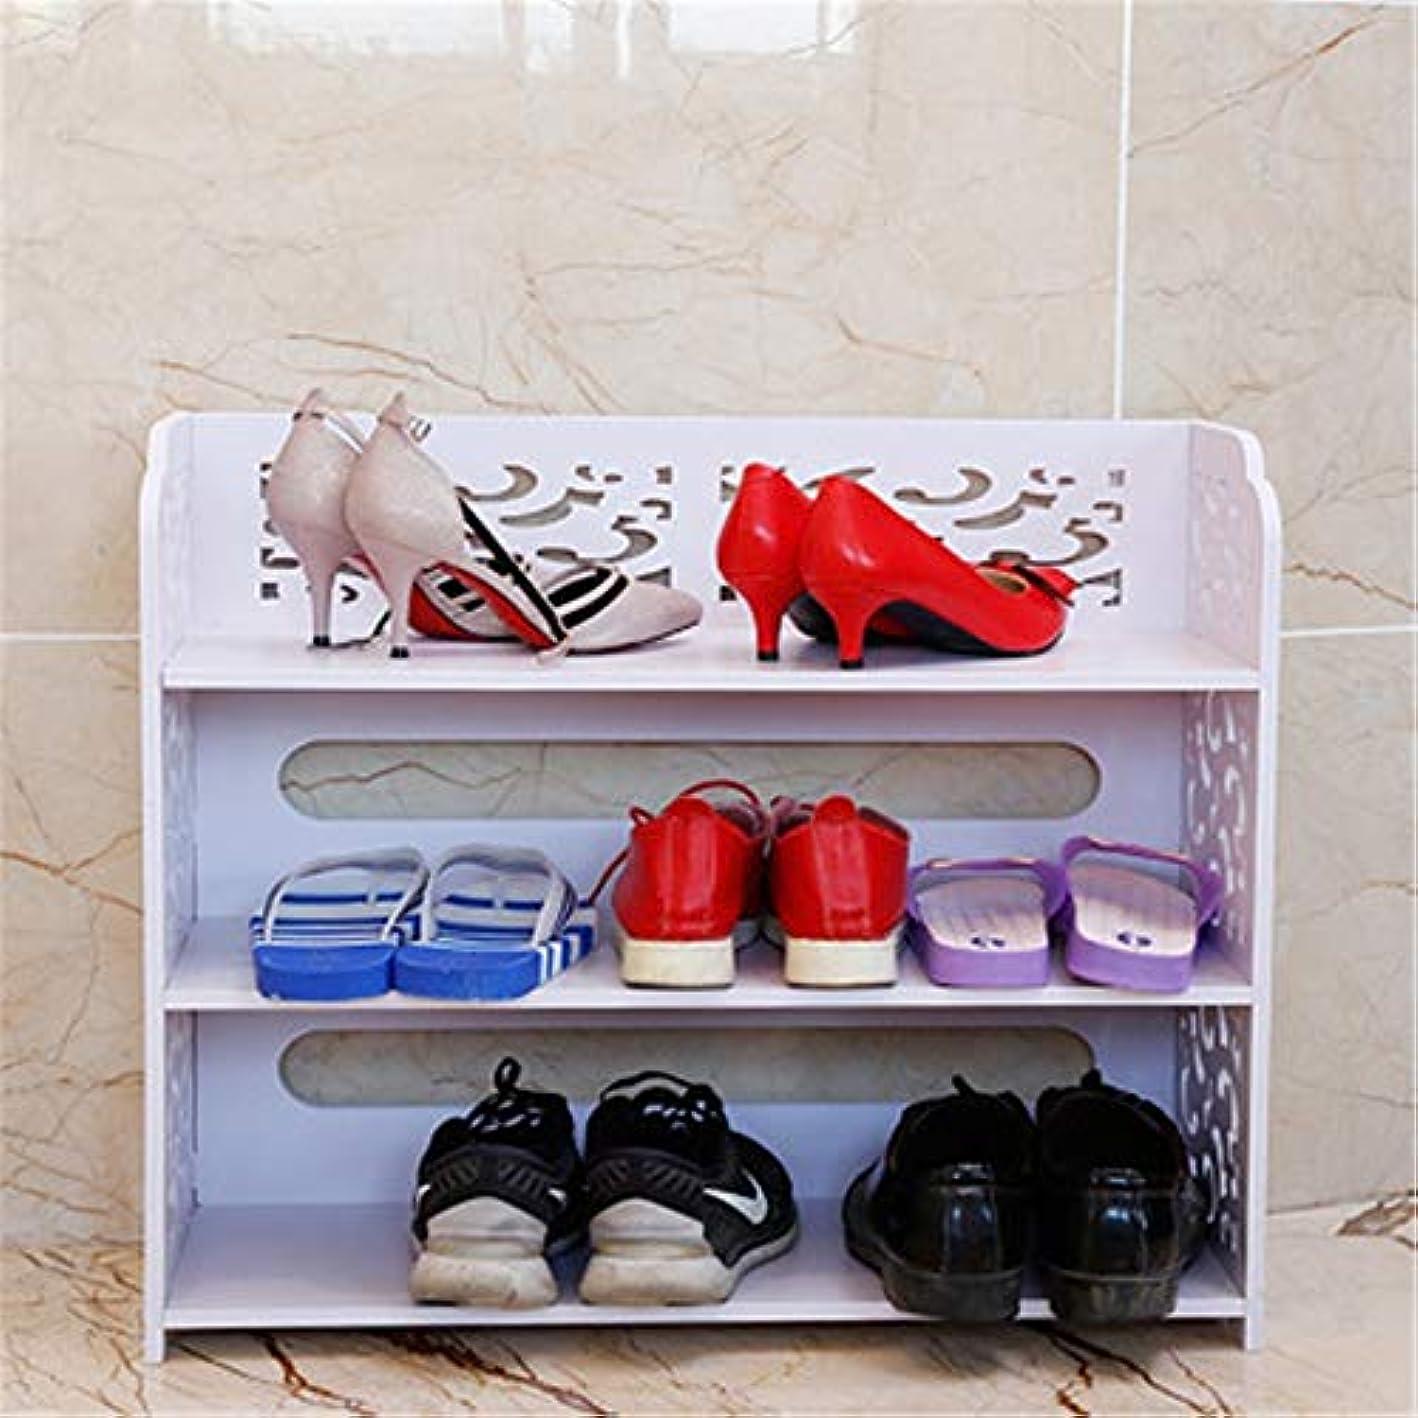 Ybriefbag-Home Simple Shoe Rack Wood Plastic Board Hollow Multi-Layer Assembly Shoe,Living Room Bedroom Waterproof Storage Shoe Rack Shoe Organizer